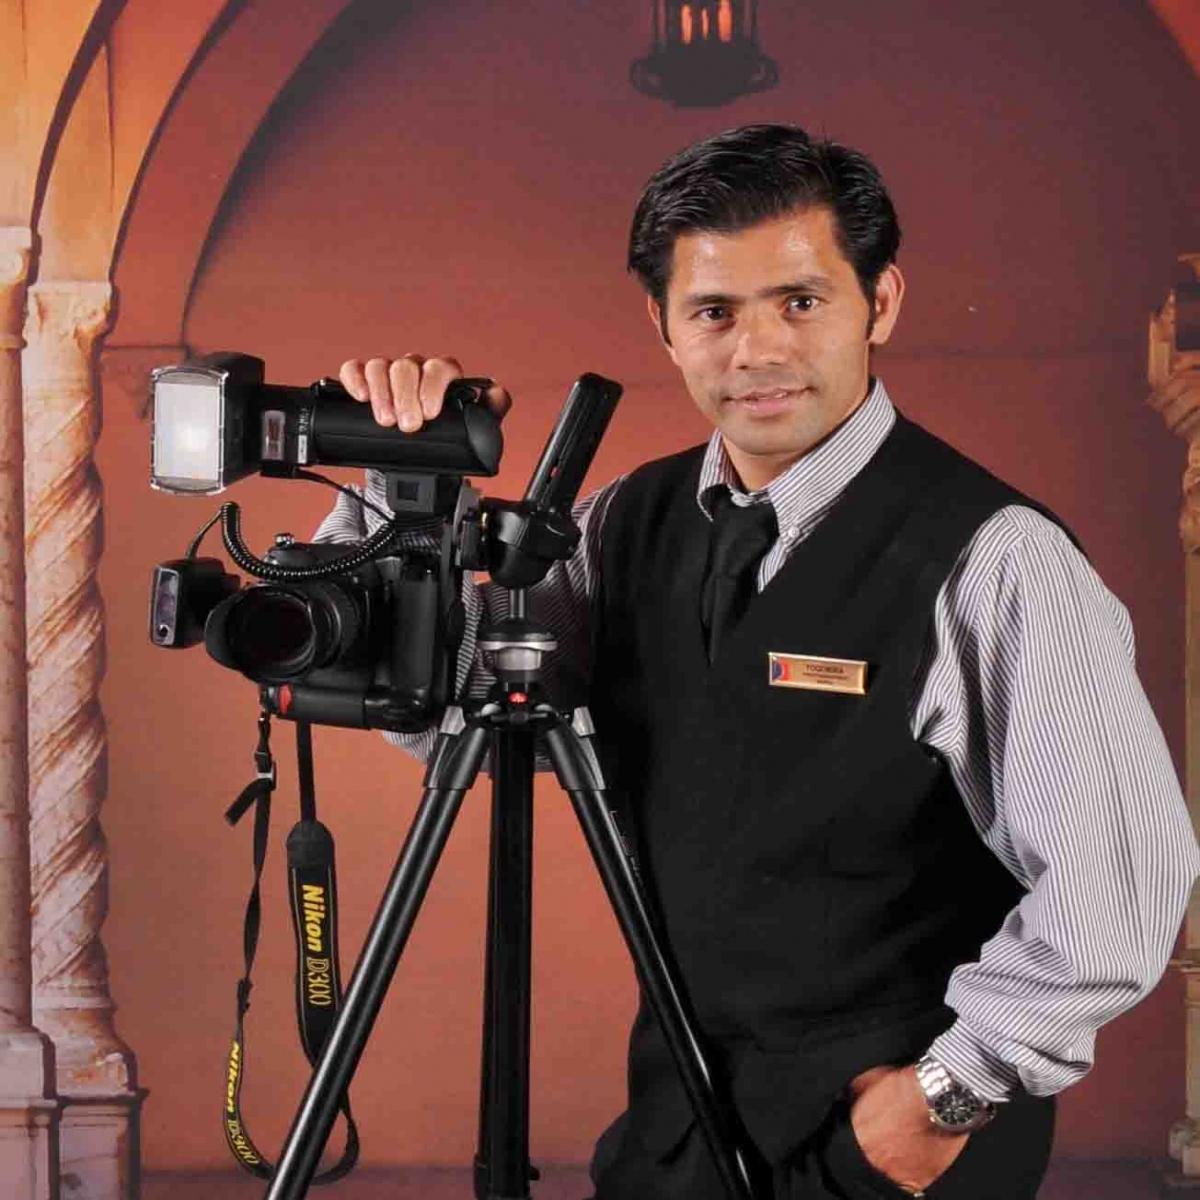 Sr. Photographer Yogendra Jung Basnet